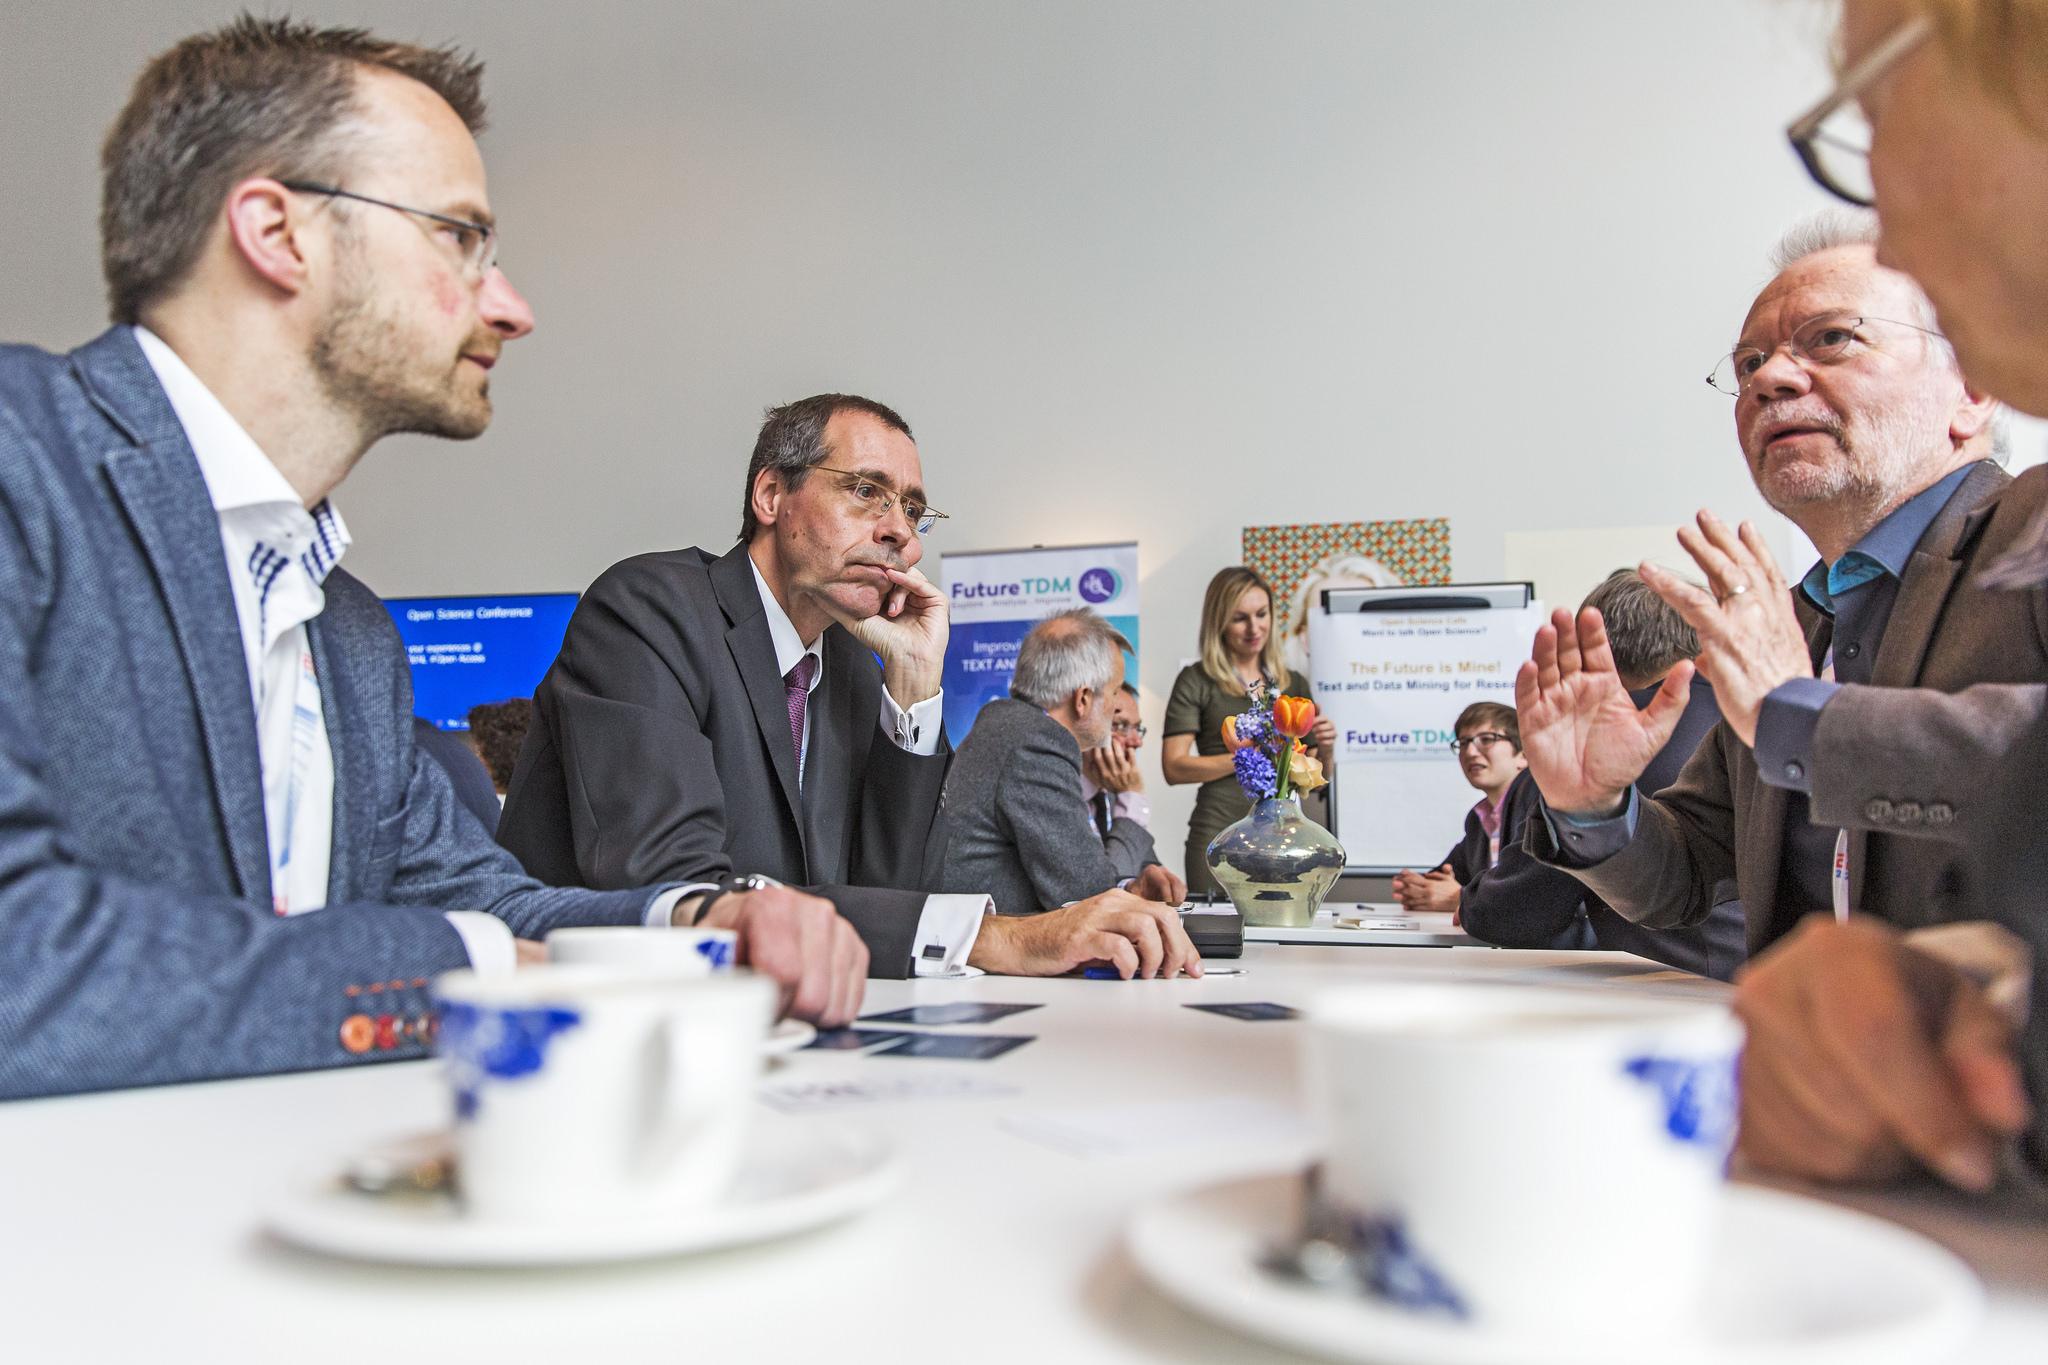 The FutureTDM Open Science Cafe. Image CC BY NL2016EU